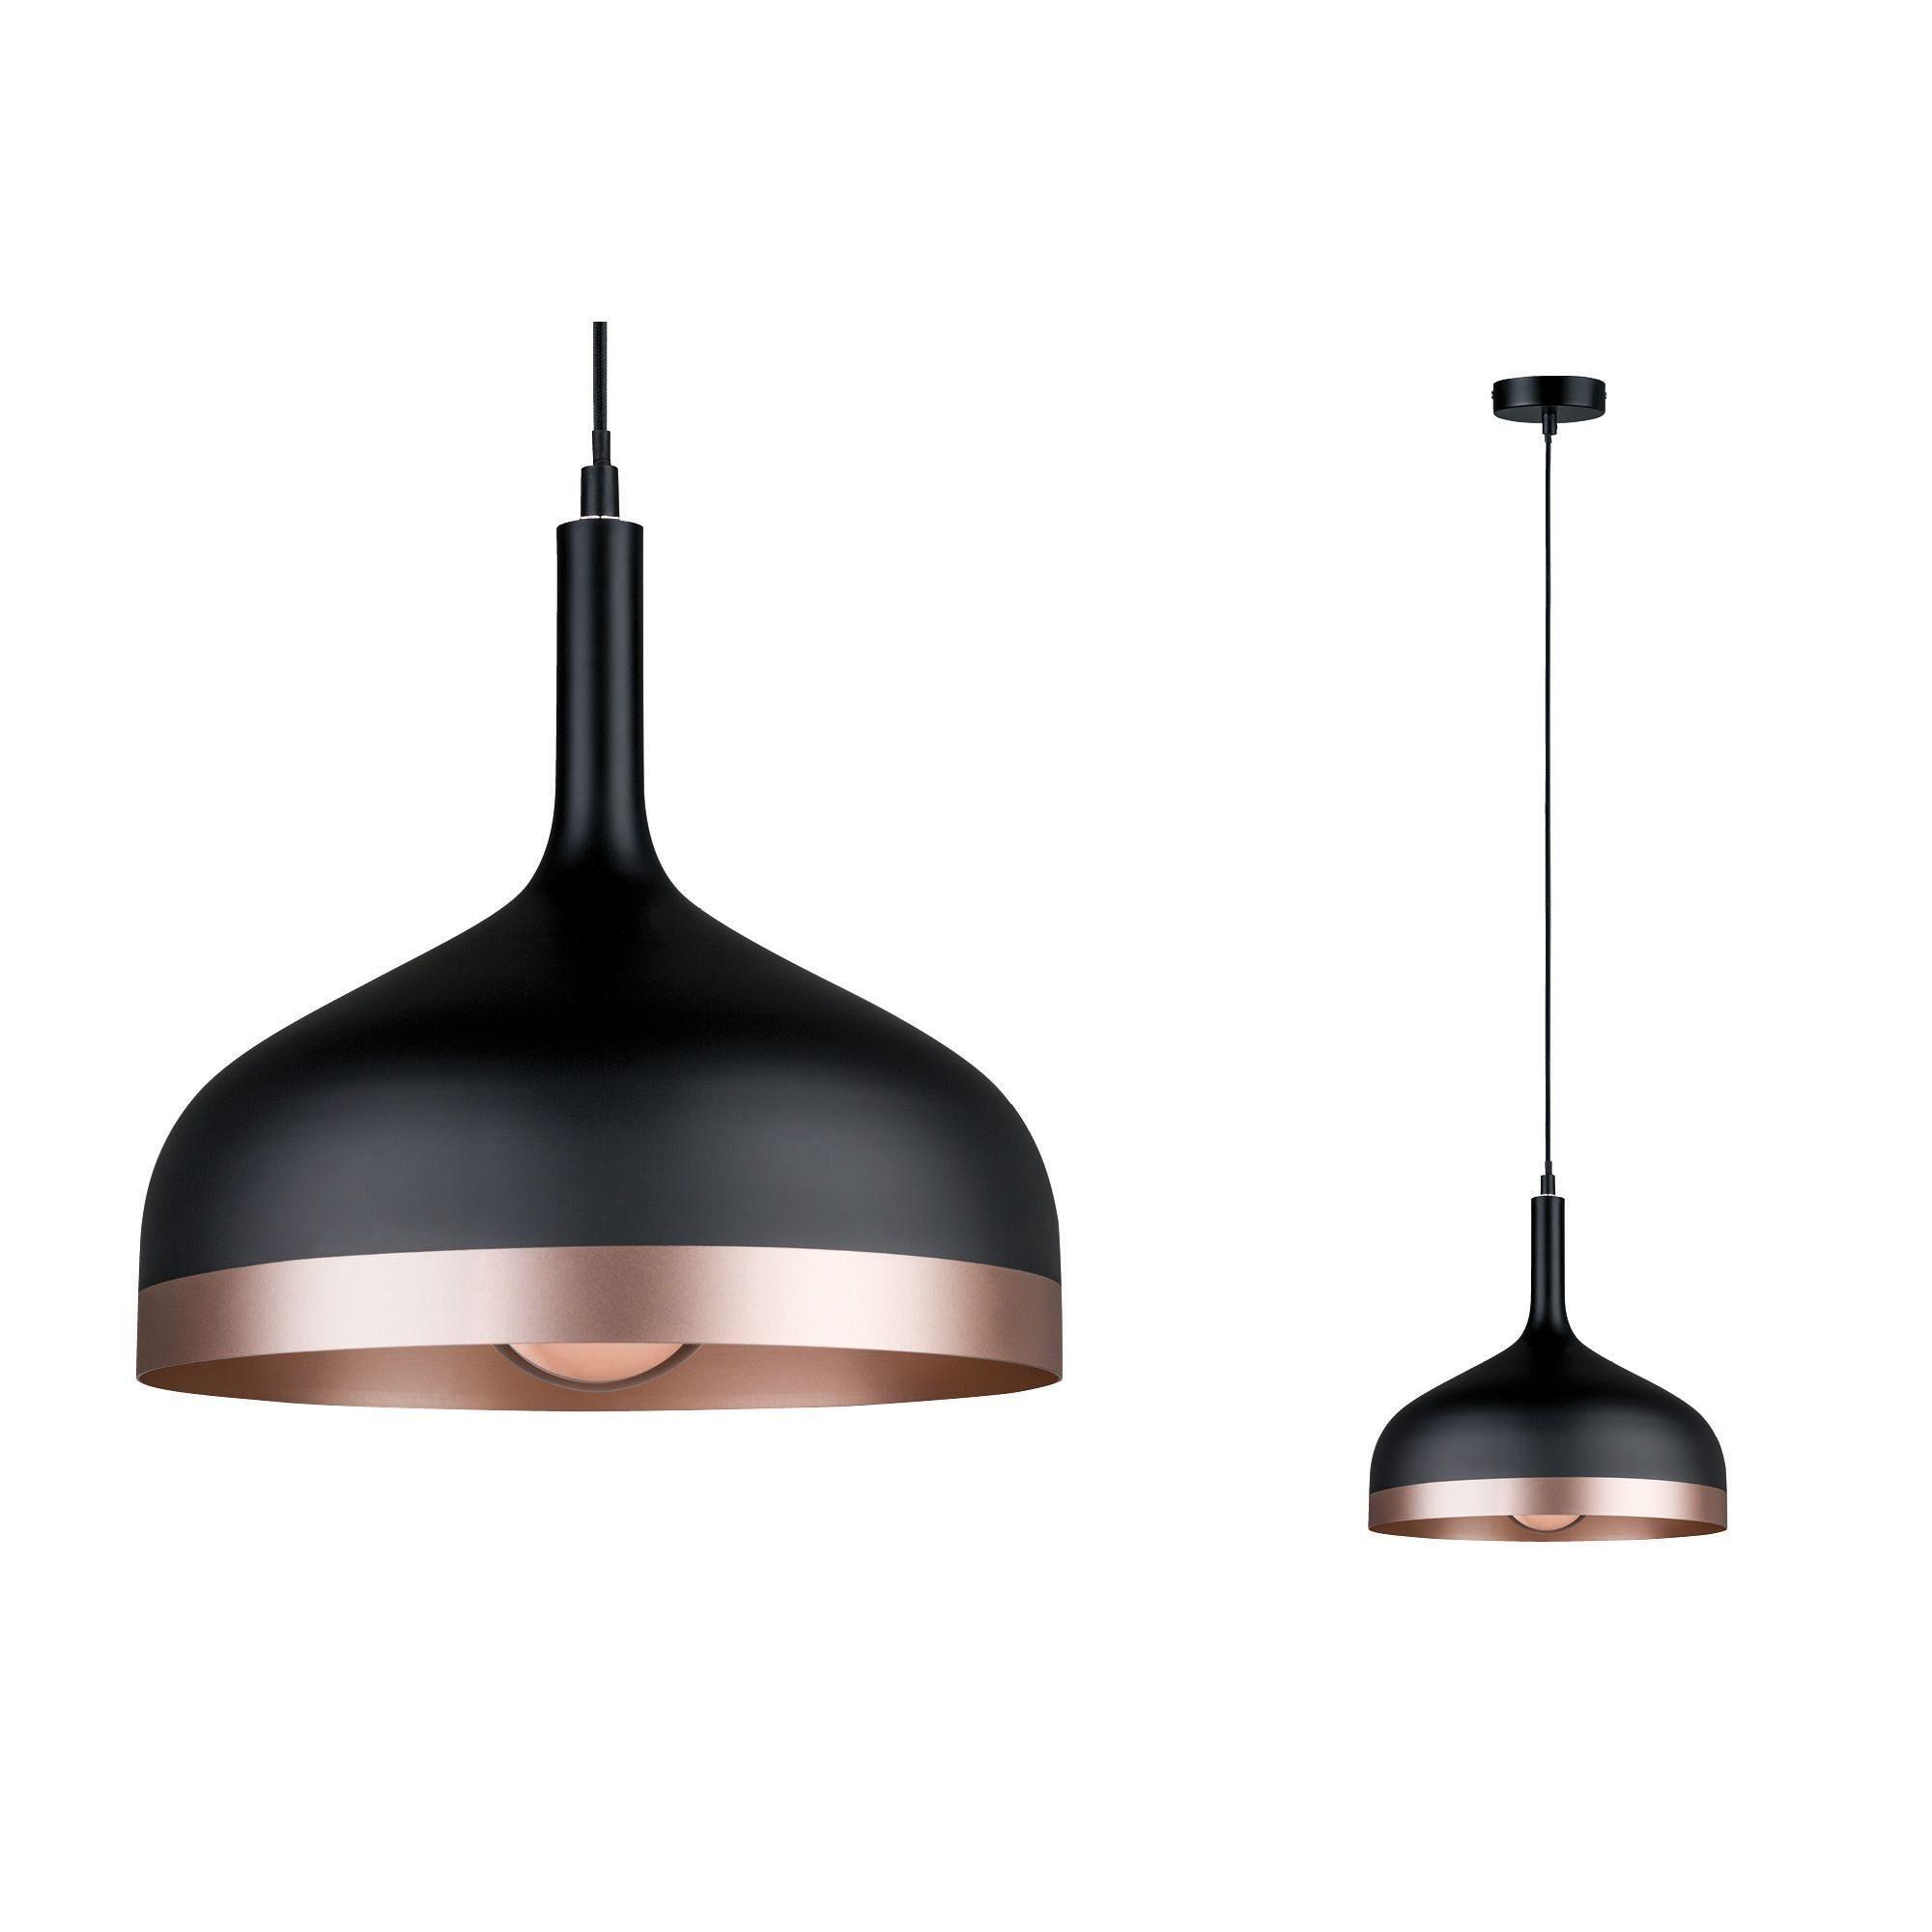 Paulmann LED Pendelleuchte Neordic Embla Schwarz/Kupfer, E27, 1 St. günstig online kaufen